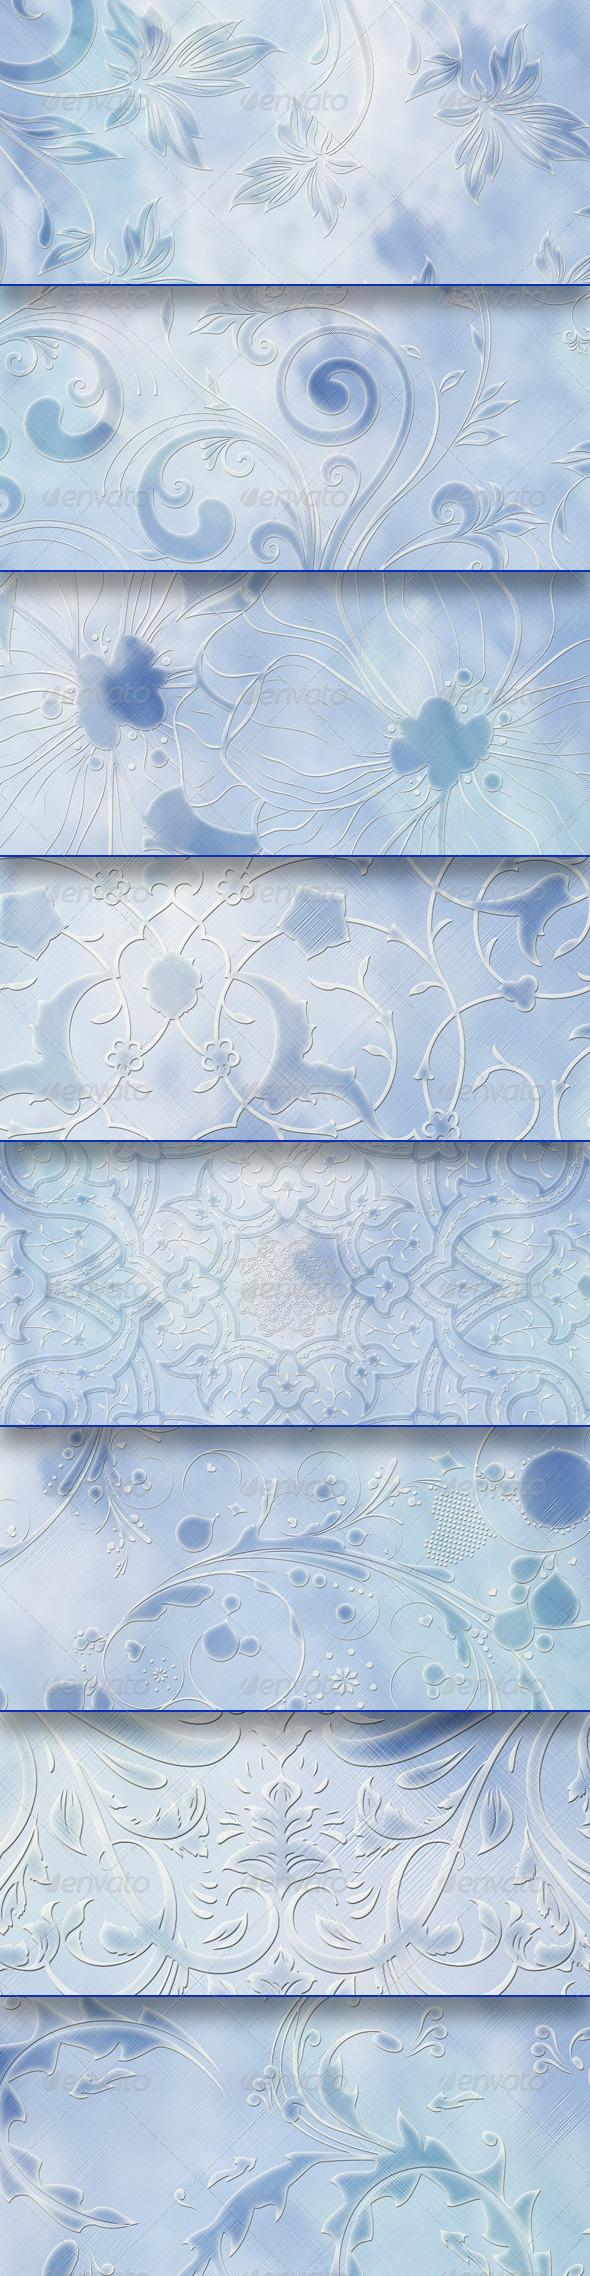 Blue Light Backgrounds - Patterns Backgrounds